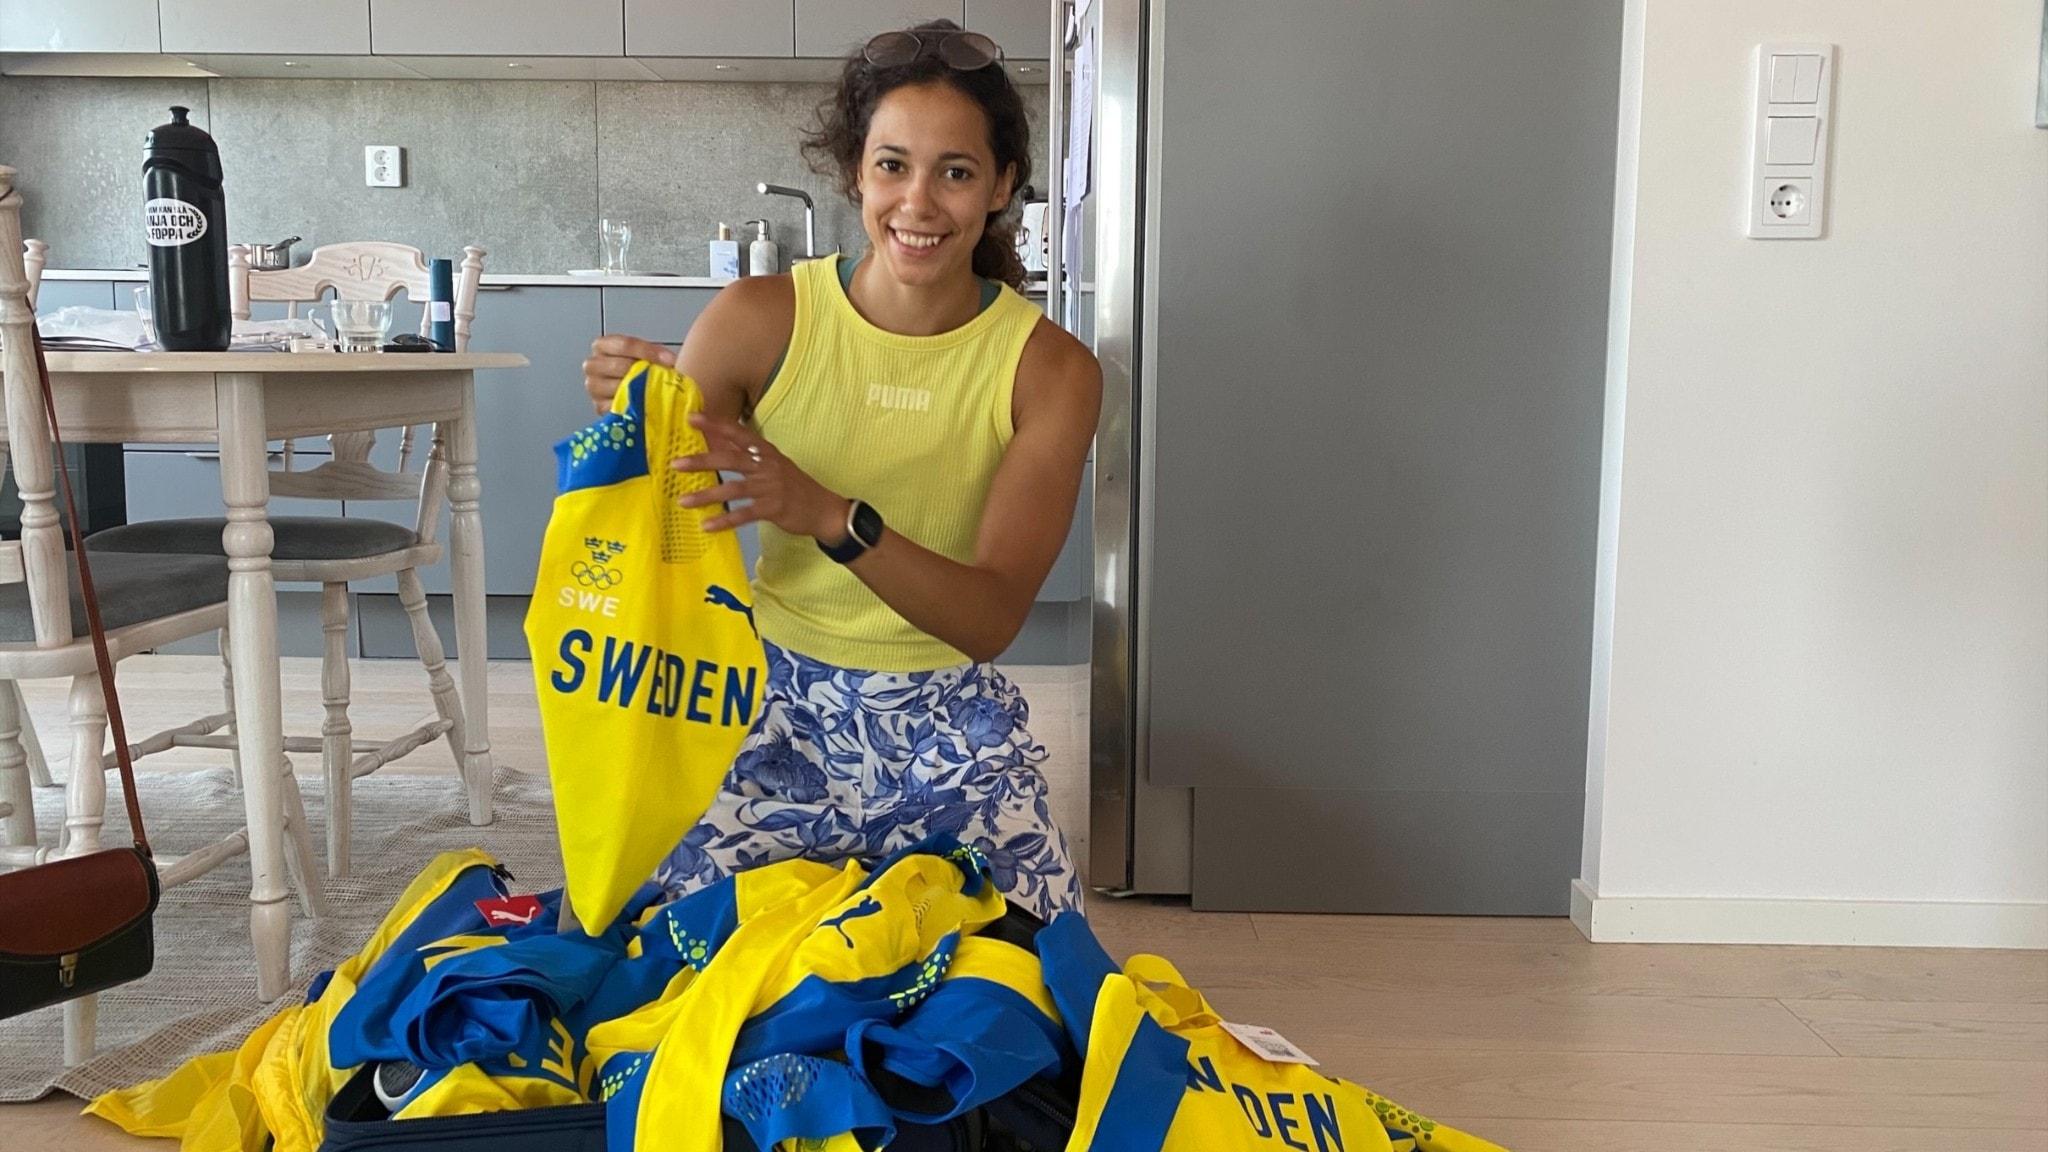 Stavhopparen packar inför sommar-OS